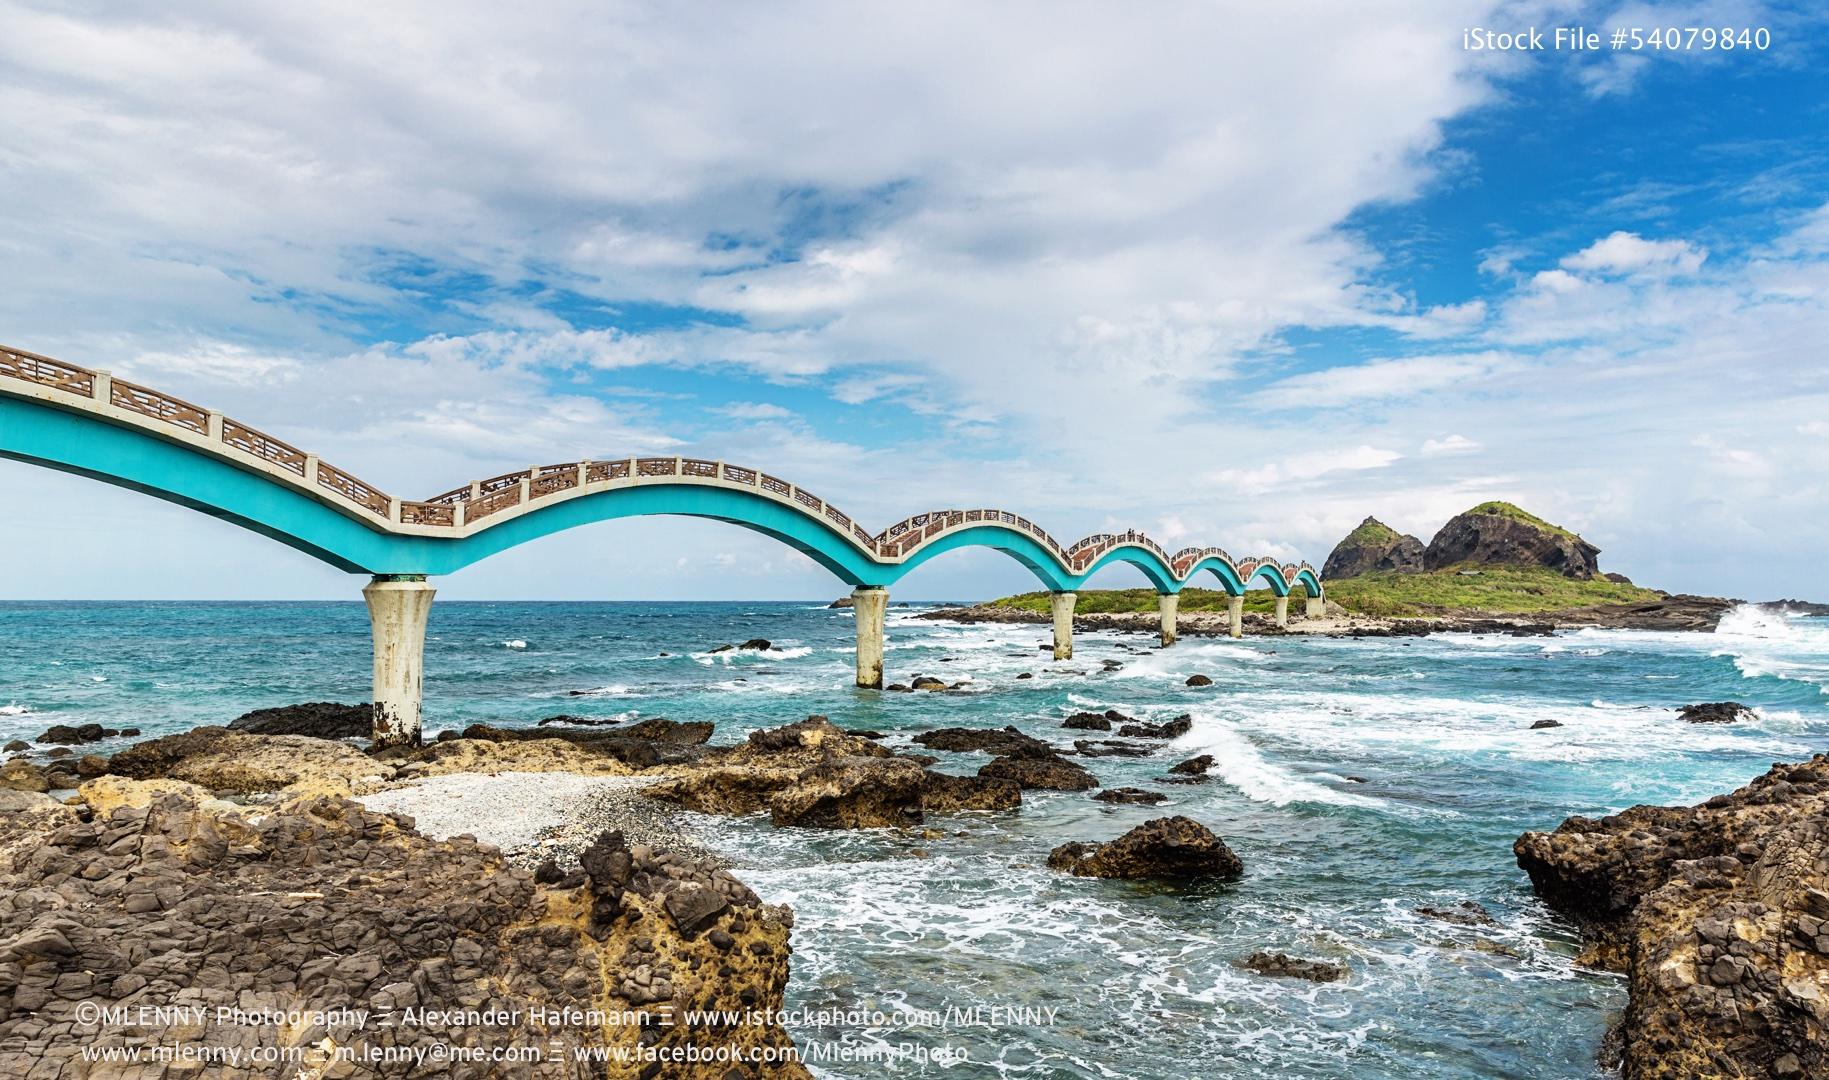 Taitung Taiwan  city photos gallery : ... Sanxiantai Island and the Taiwan East Coast. Taitung, Taiwan